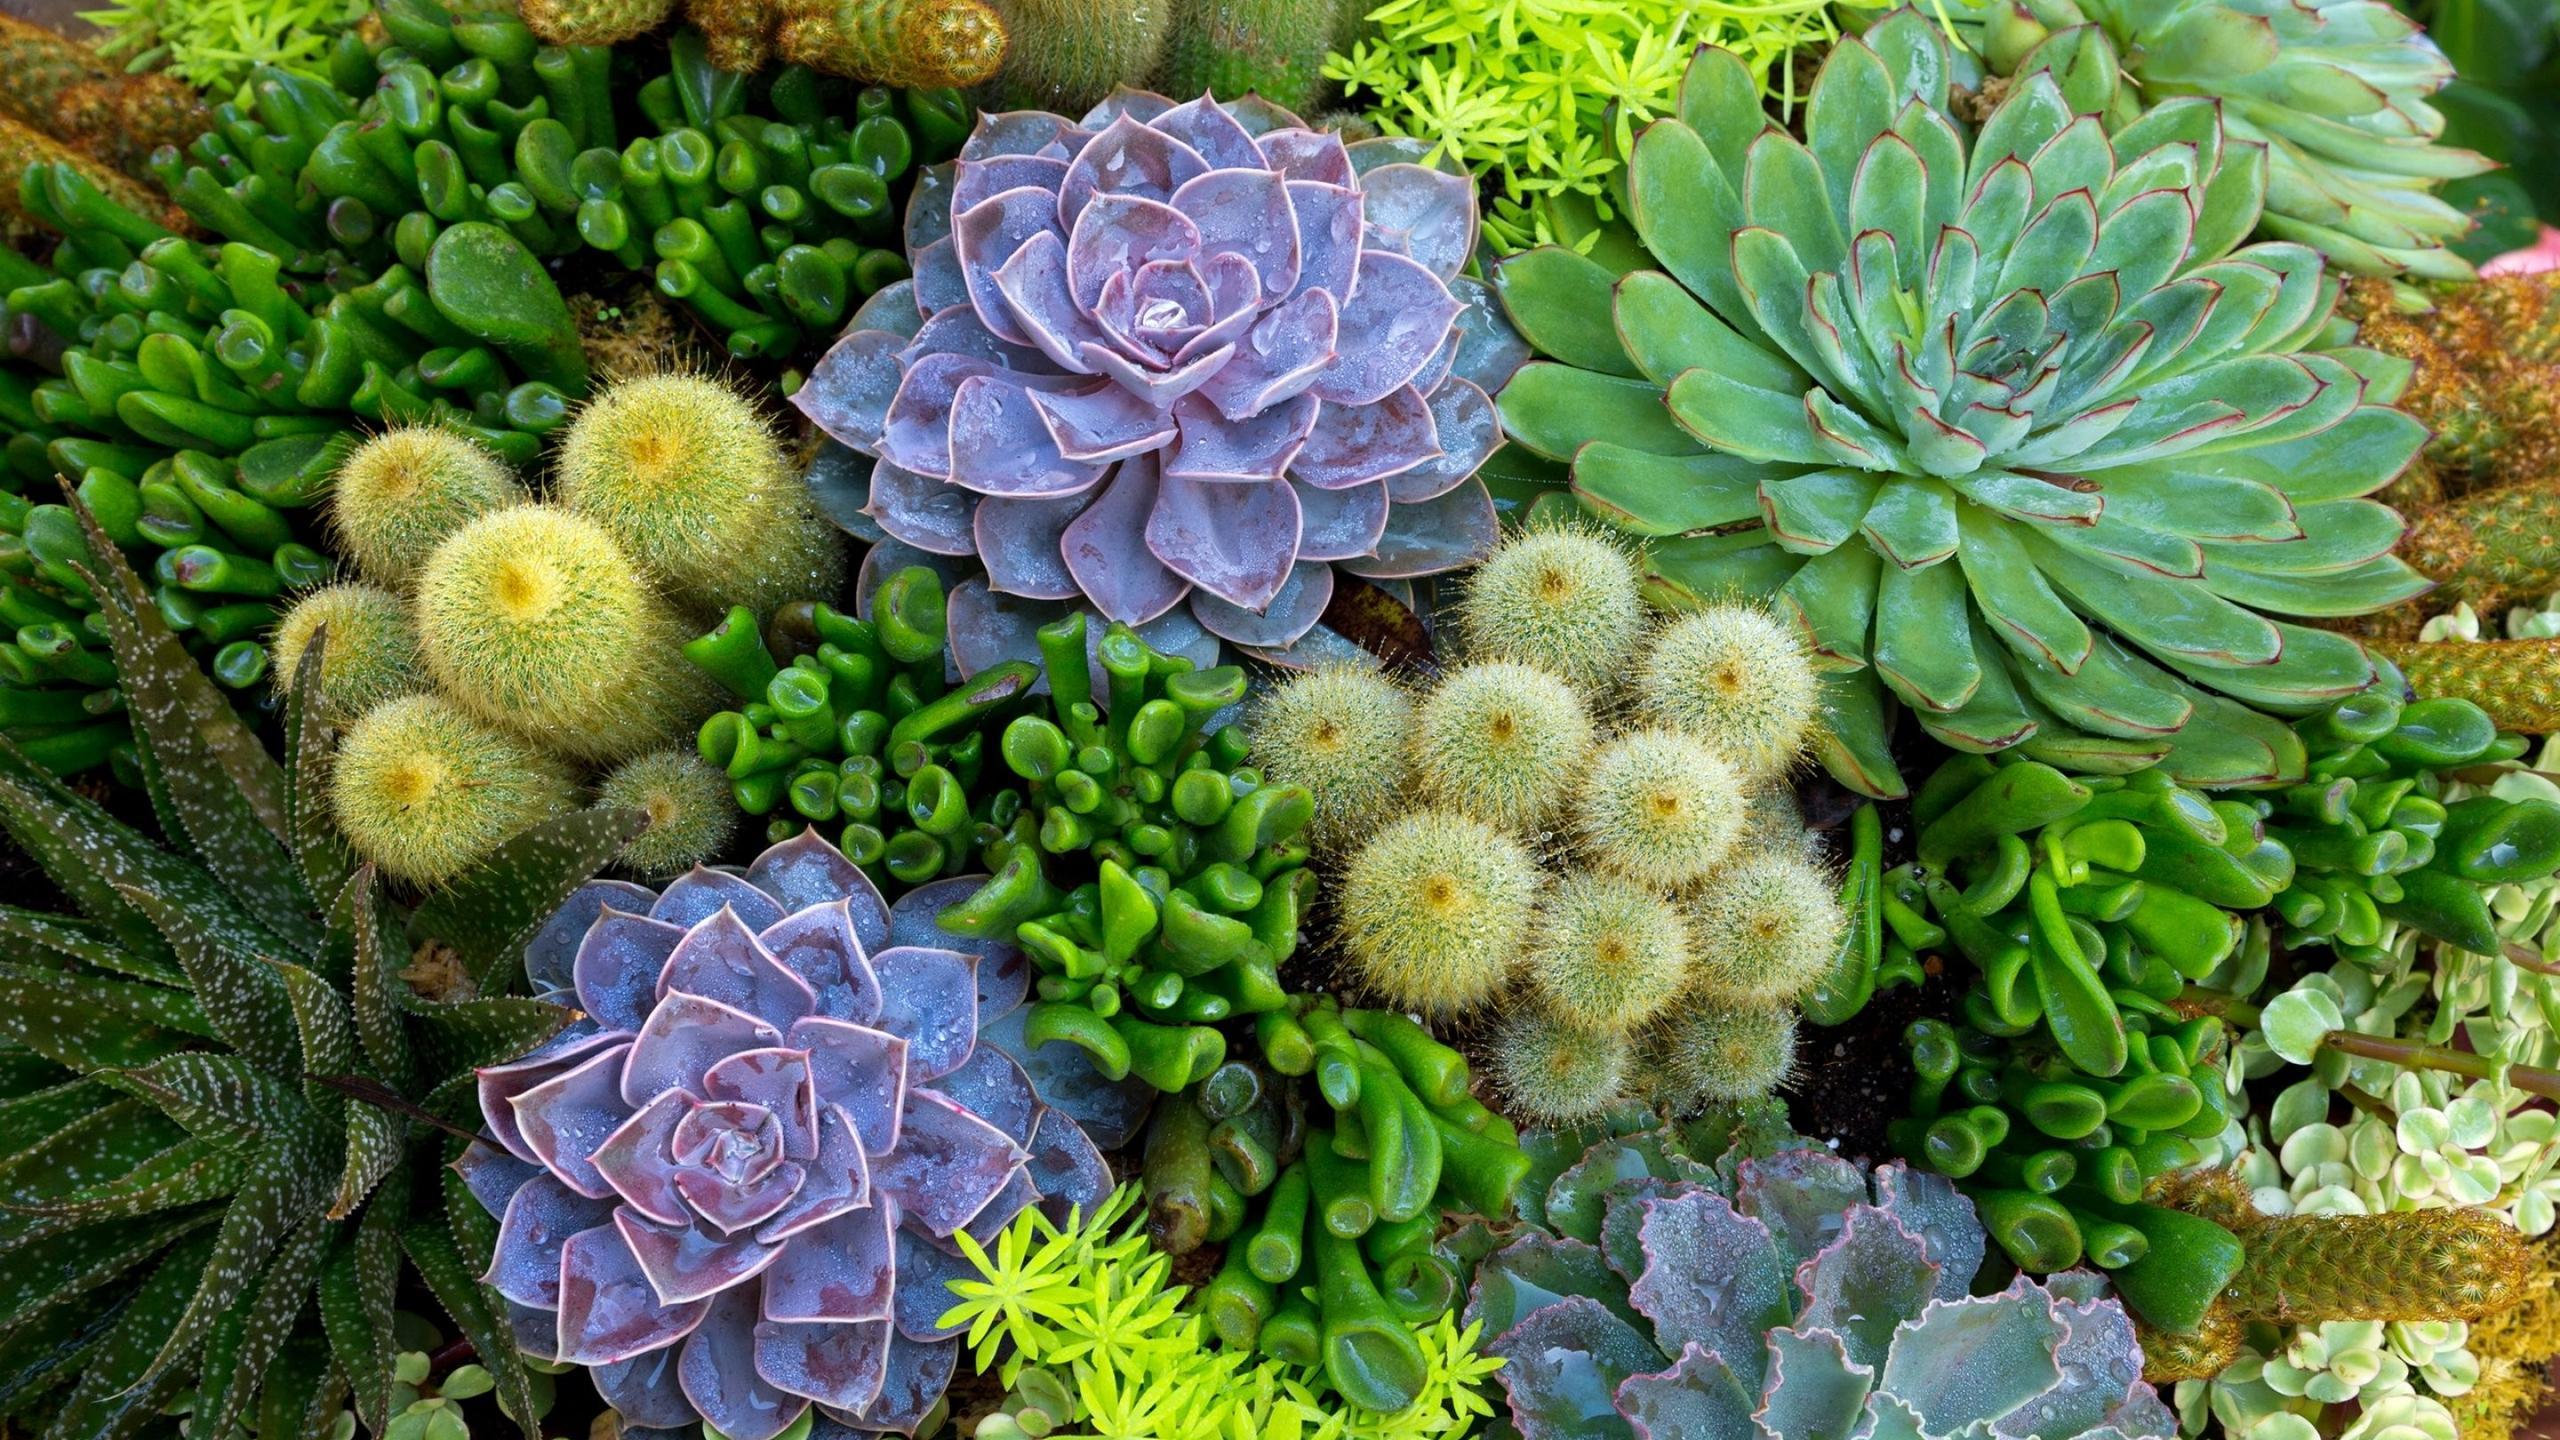 Beautiful Cactus Flowers In The Garden Hd Wallpaper Wallpaper